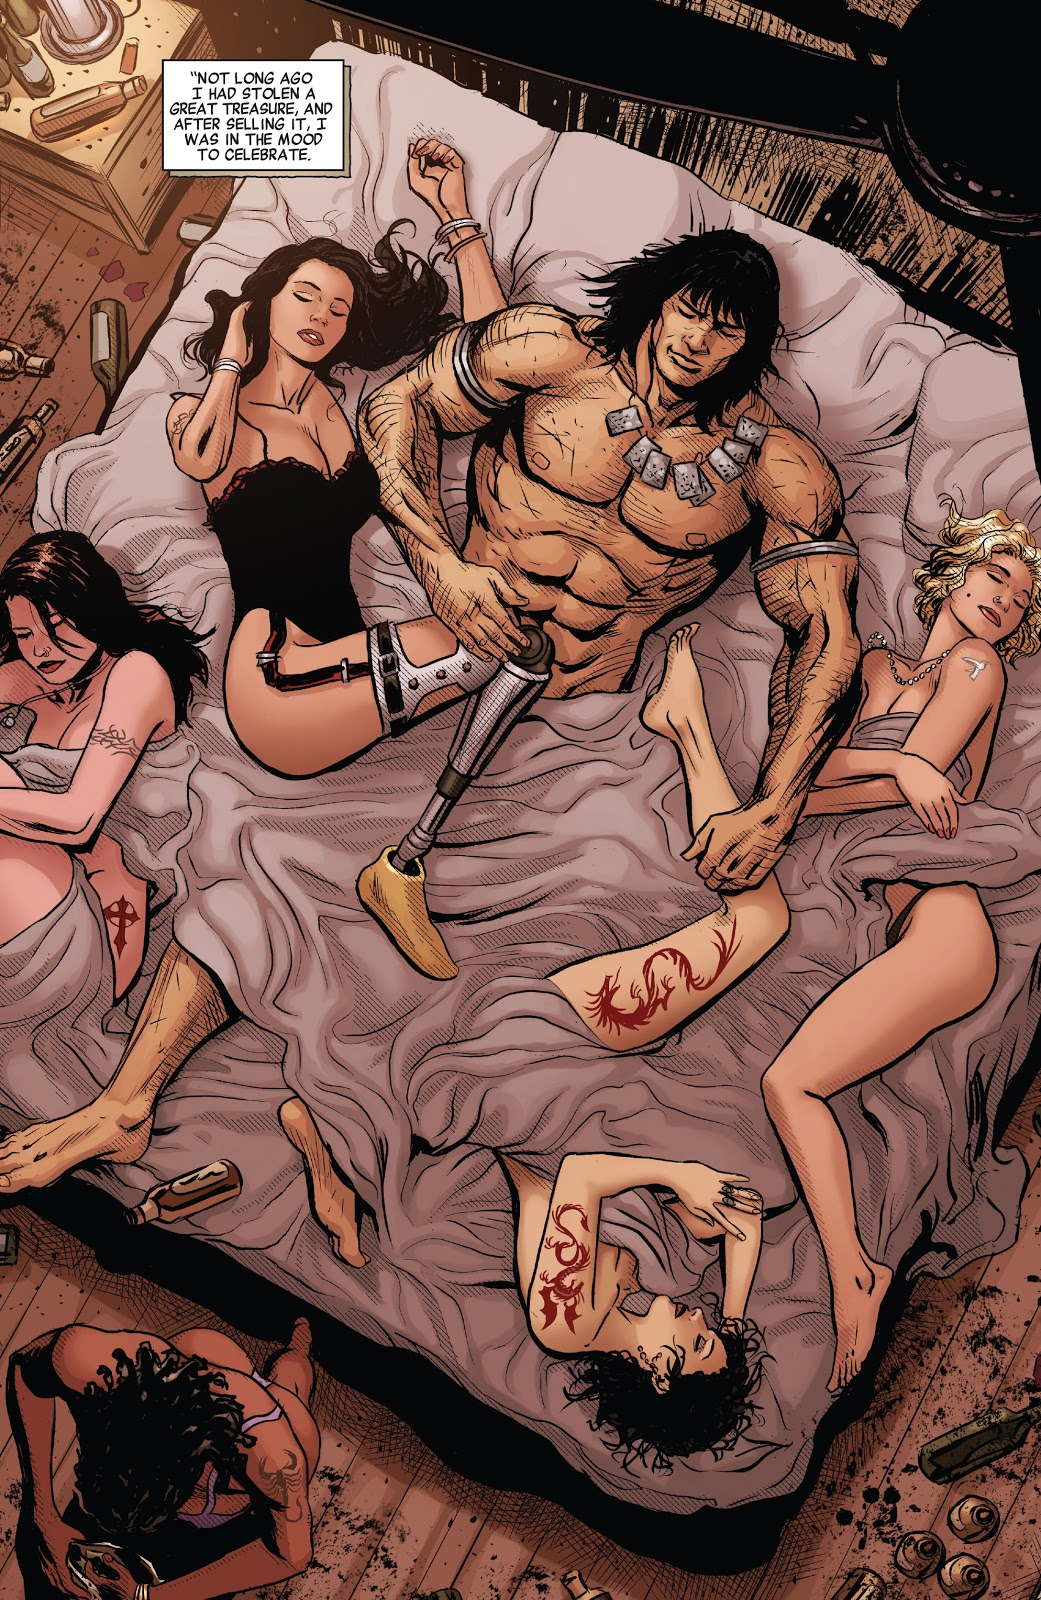 Conan The Barbarian (Savage Avengers #13)